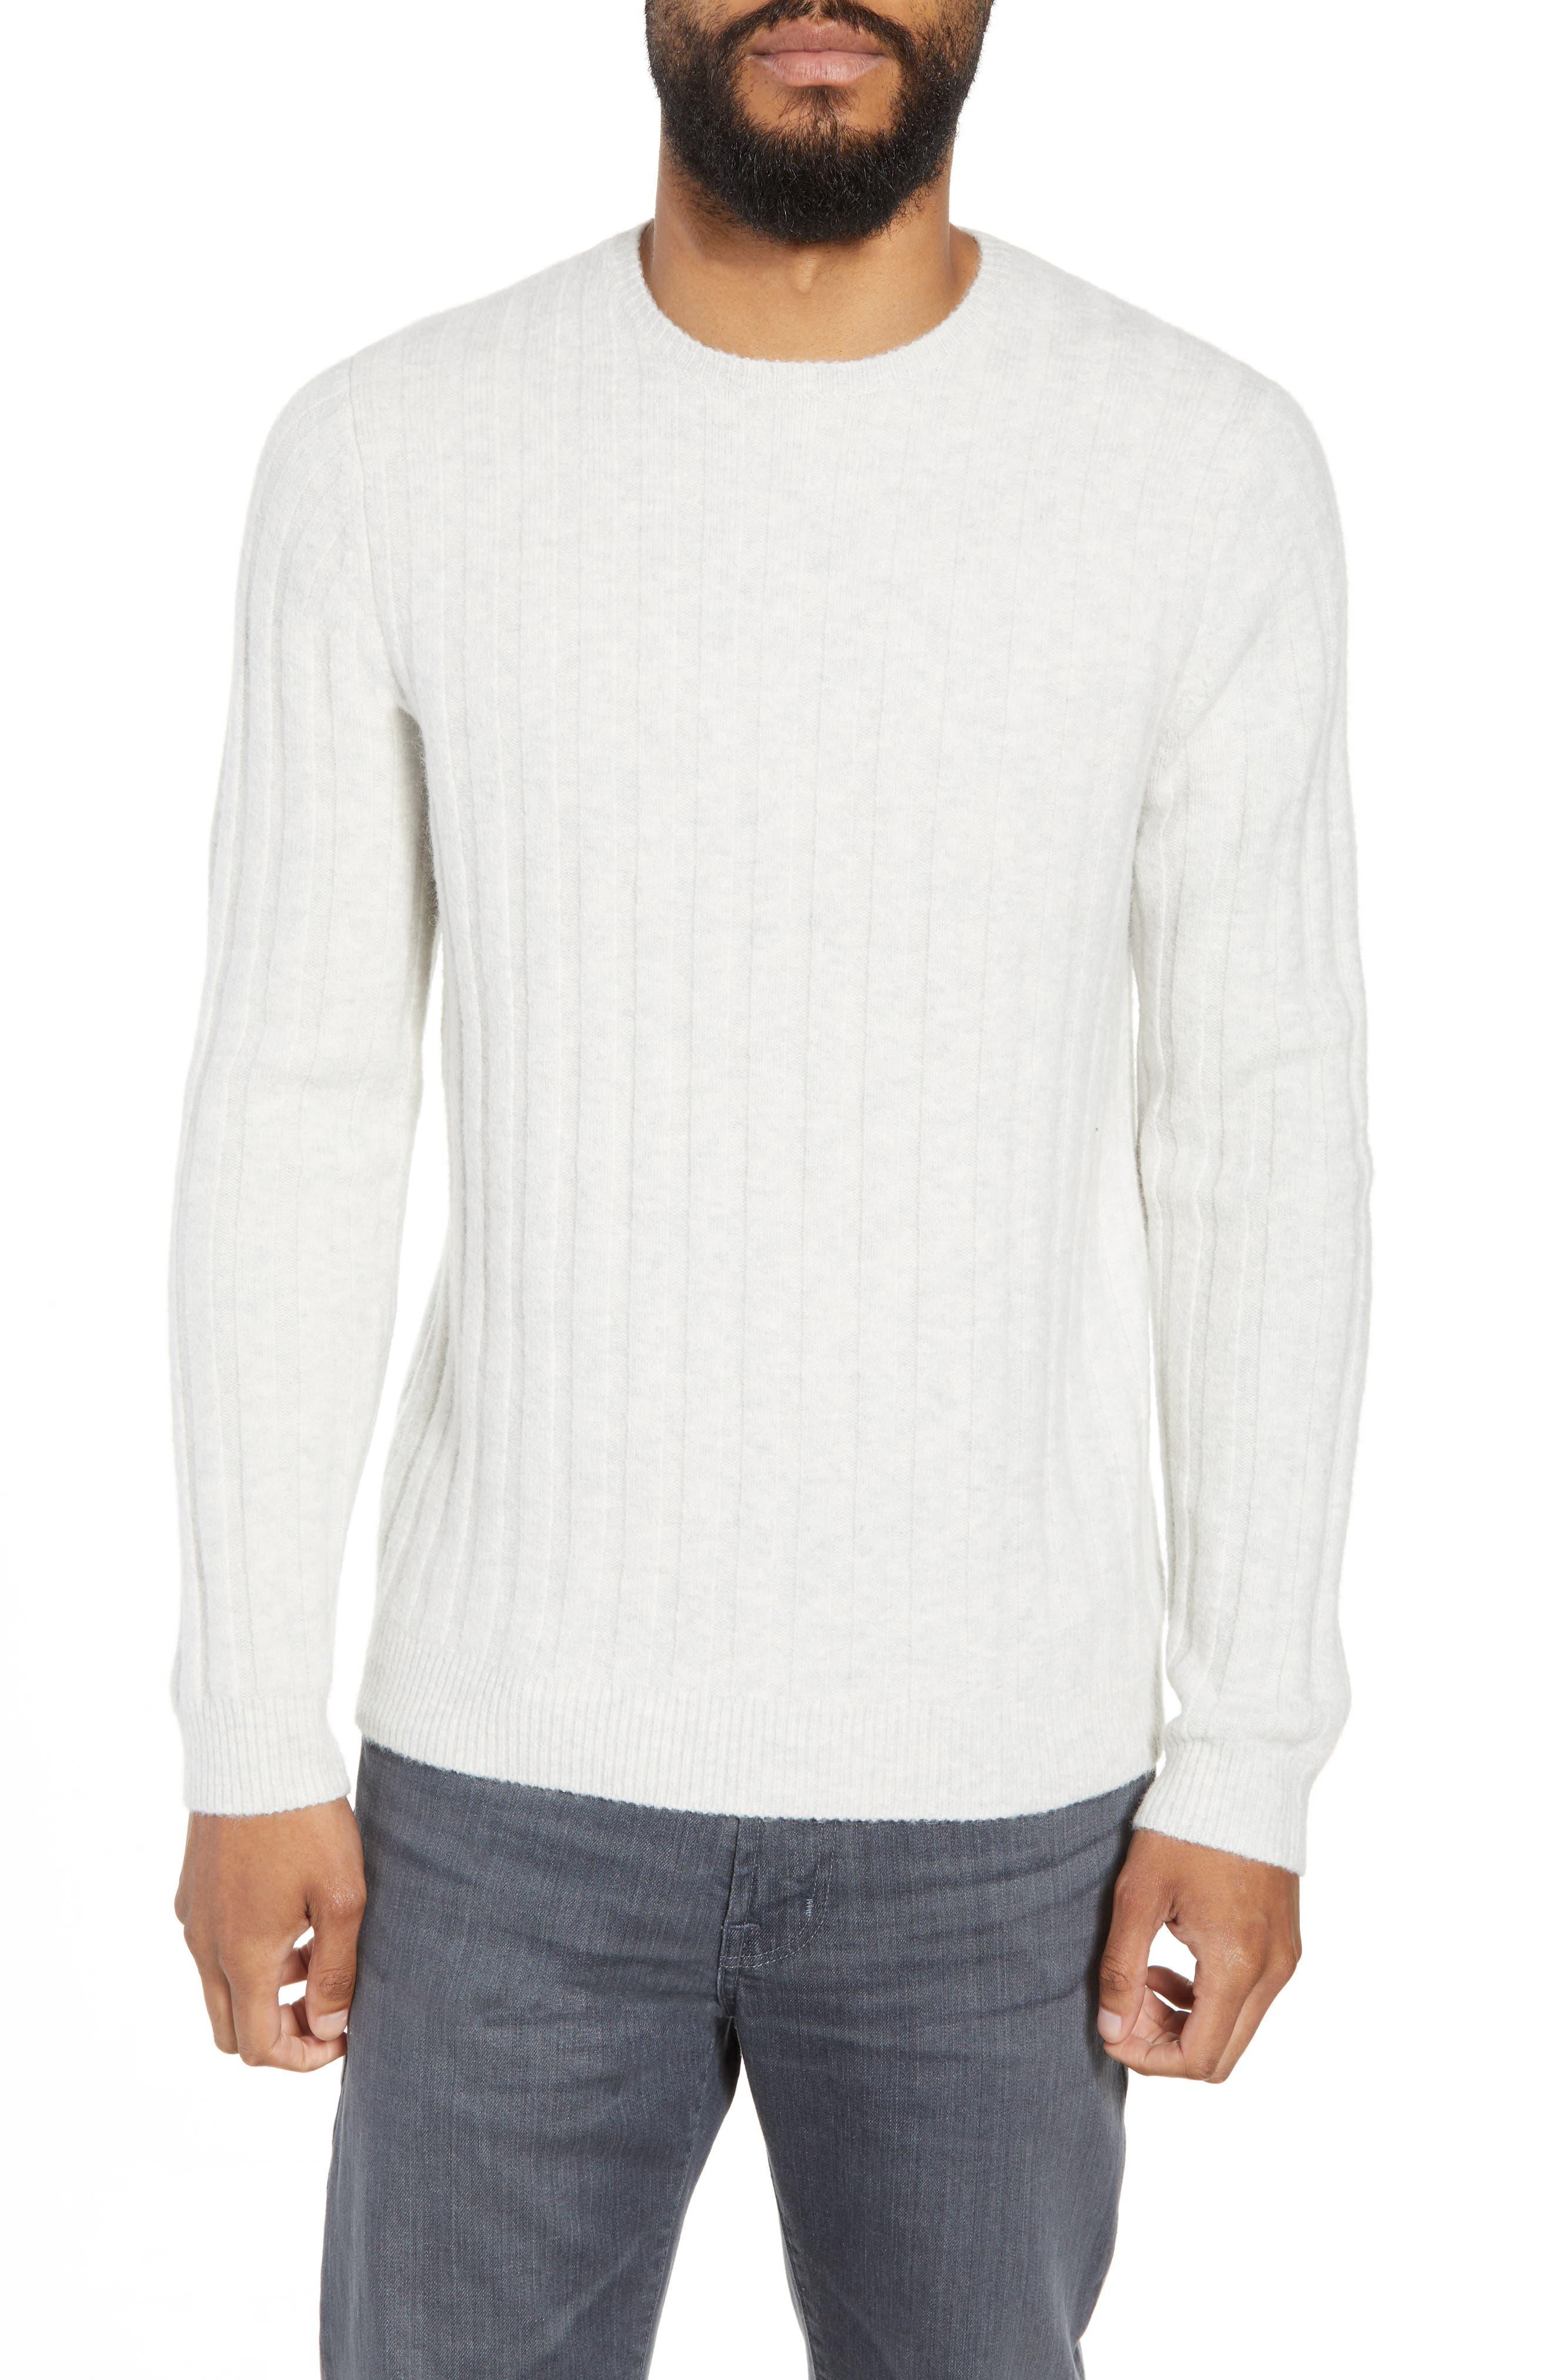 Rib Crewneck Sweater, Main, color, GREY SILK HEATHER